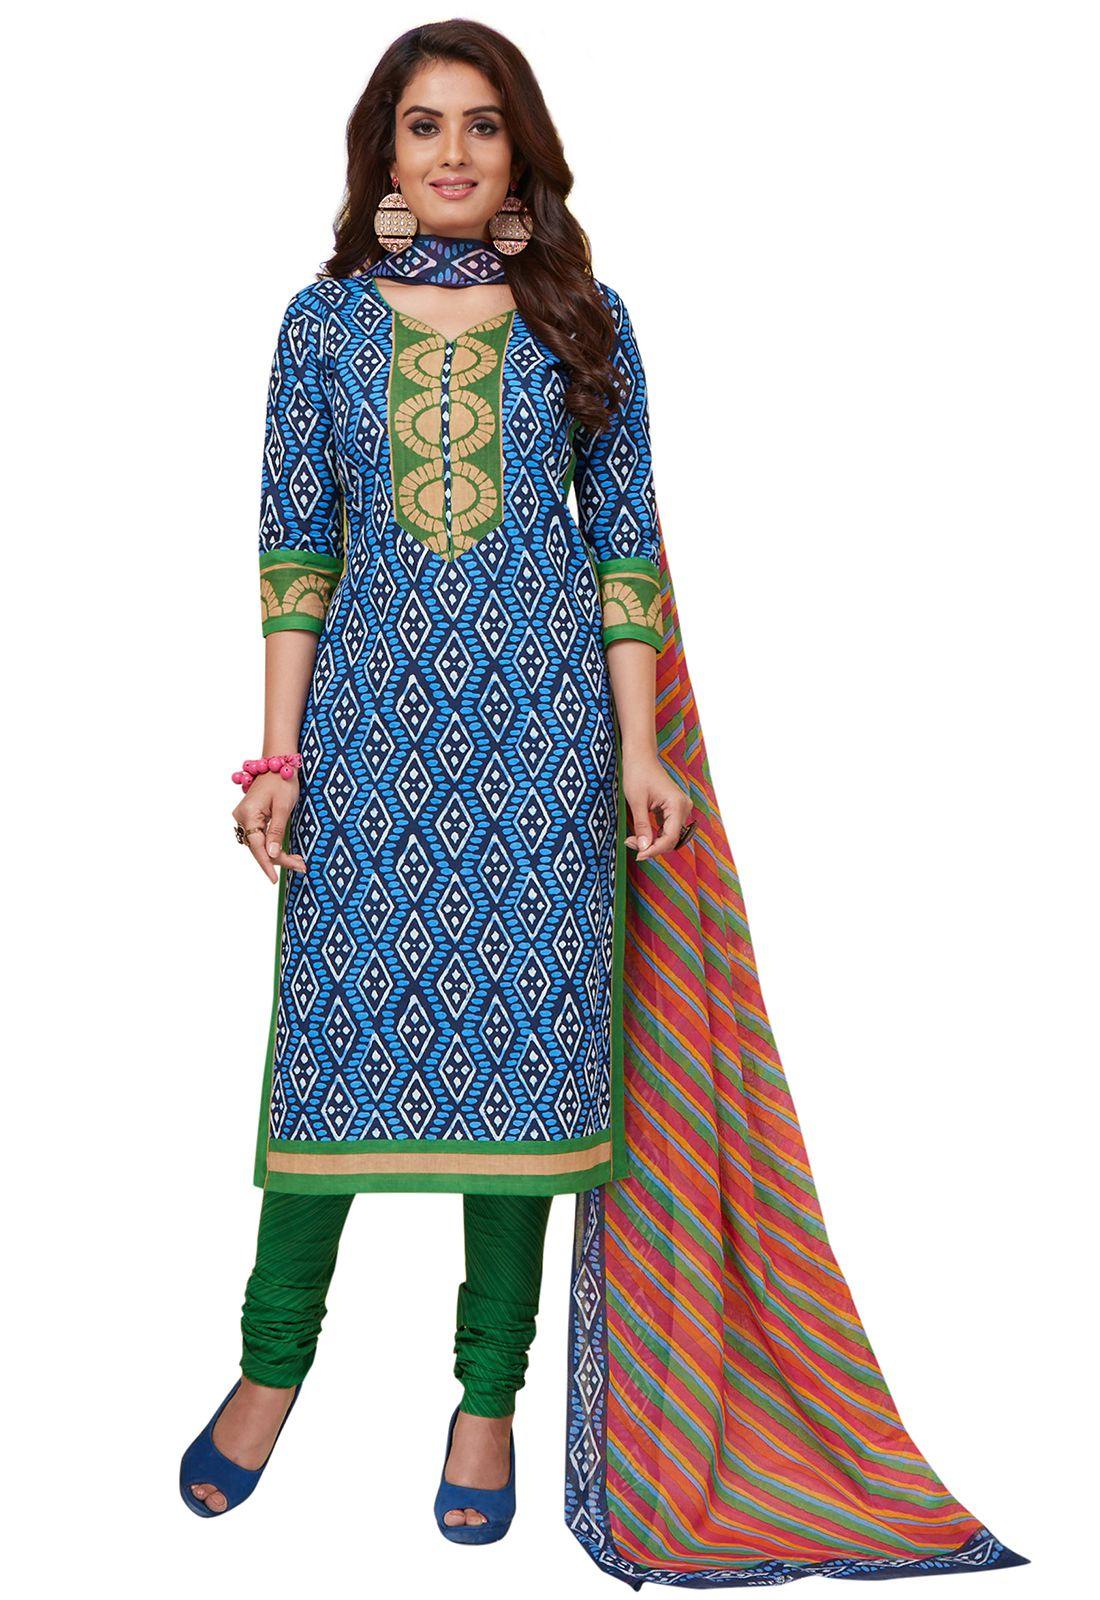 Ishin Blue Cotton Dress Material